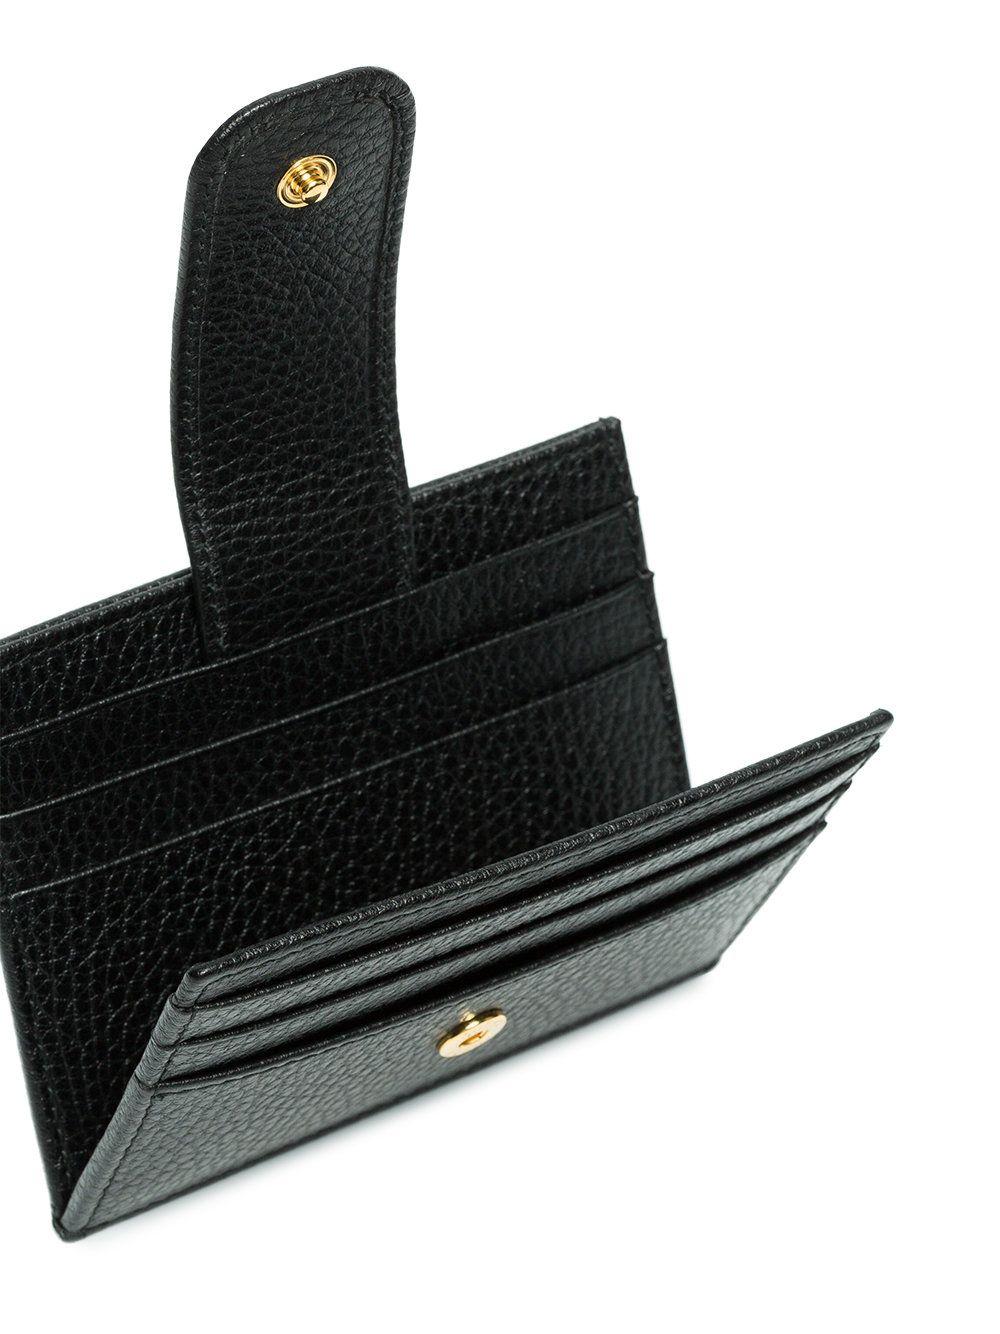 Gucci black gg marmont leather cardholder farfetch